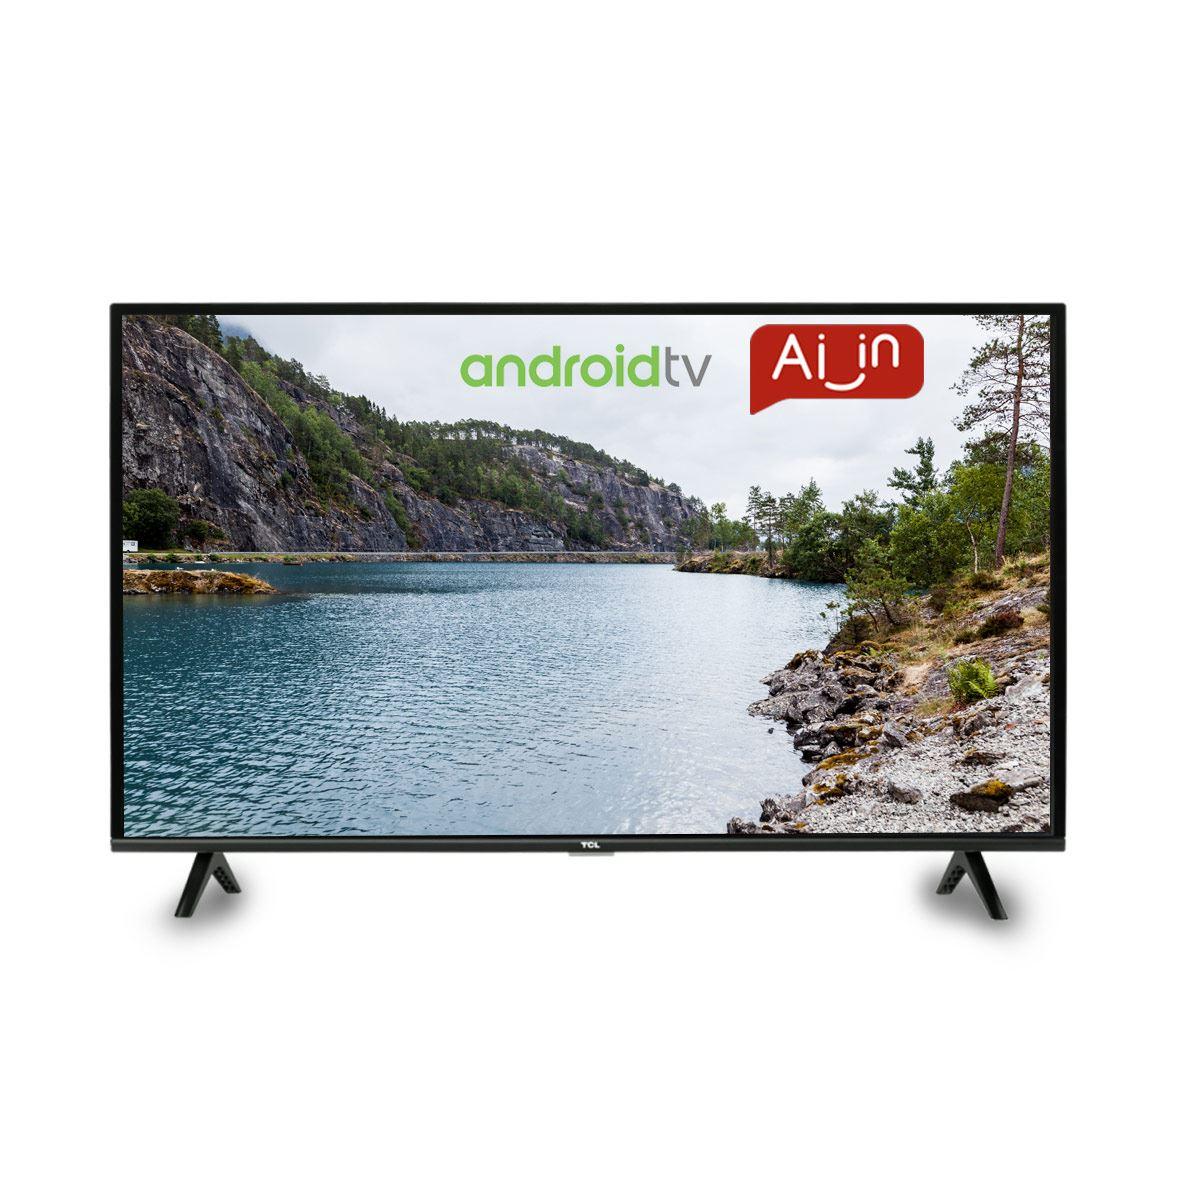 "Pantalla TCL 40"" FHD Smart TV (Android TV) 40A325"